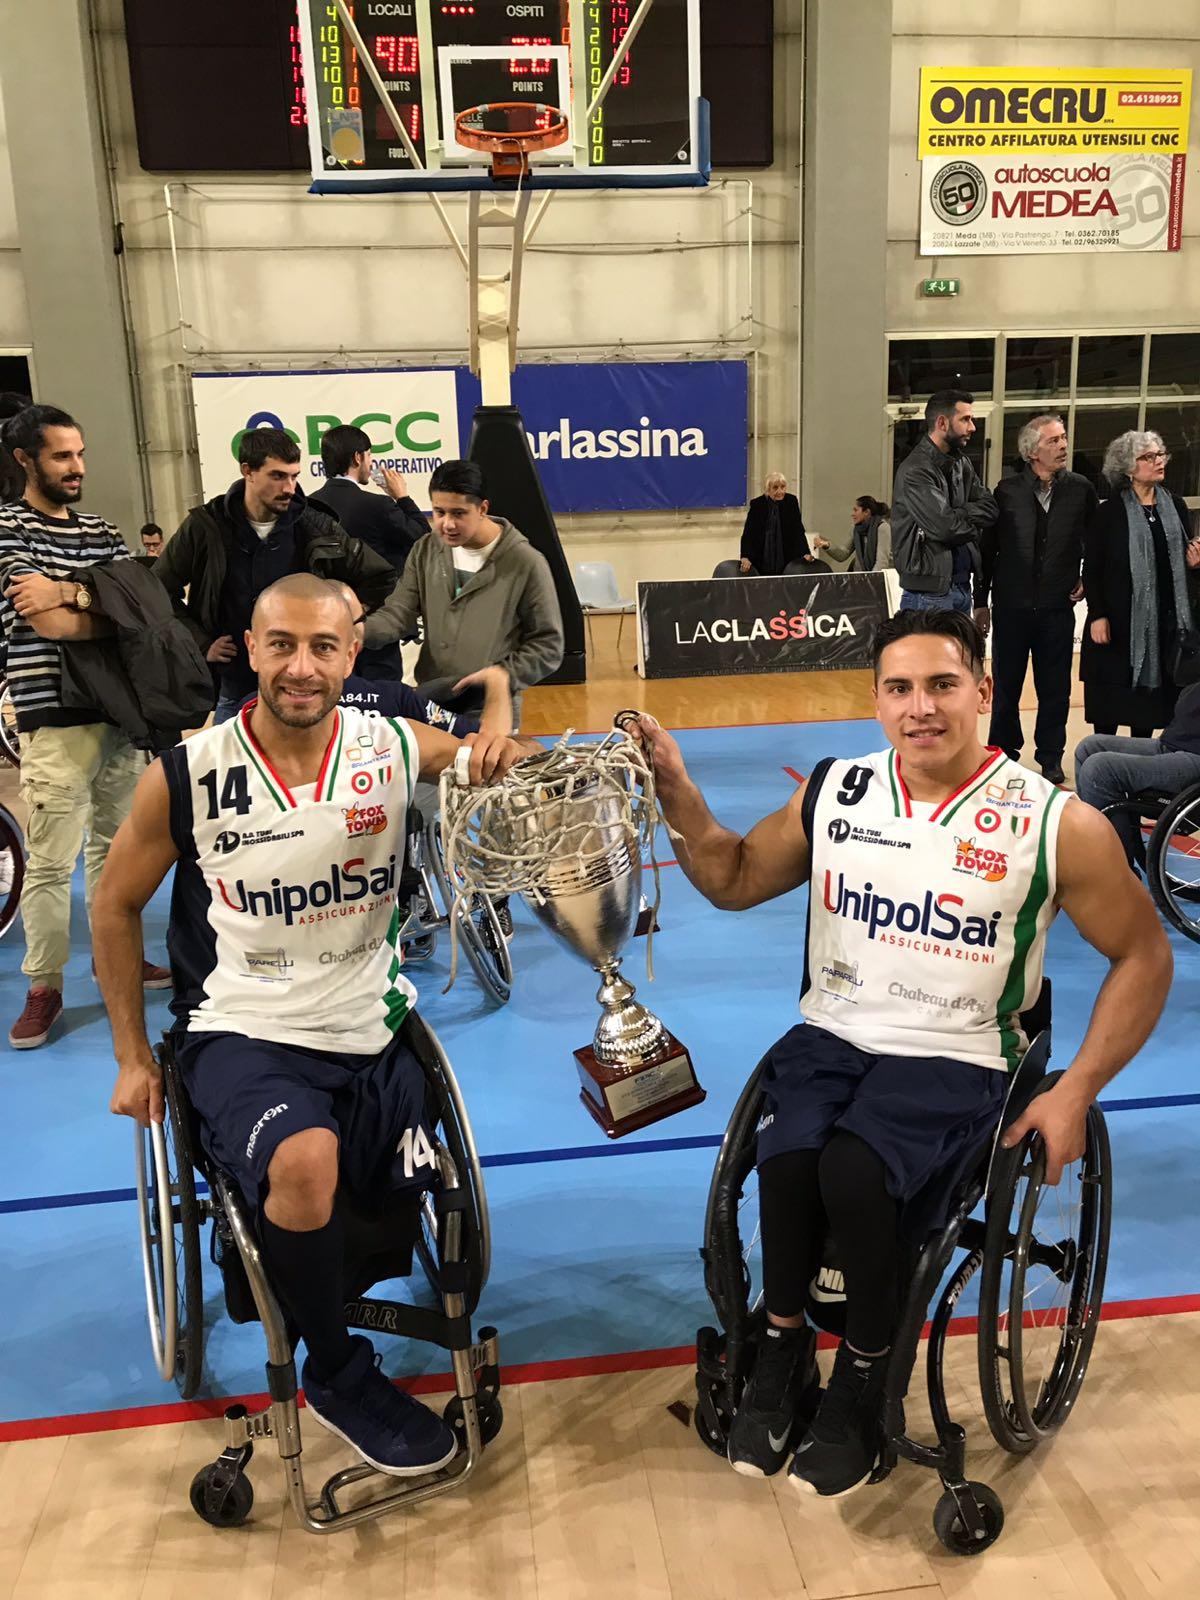 Básquet sobre silla de ruedas: Berdún y Esteche festejaron en Italia